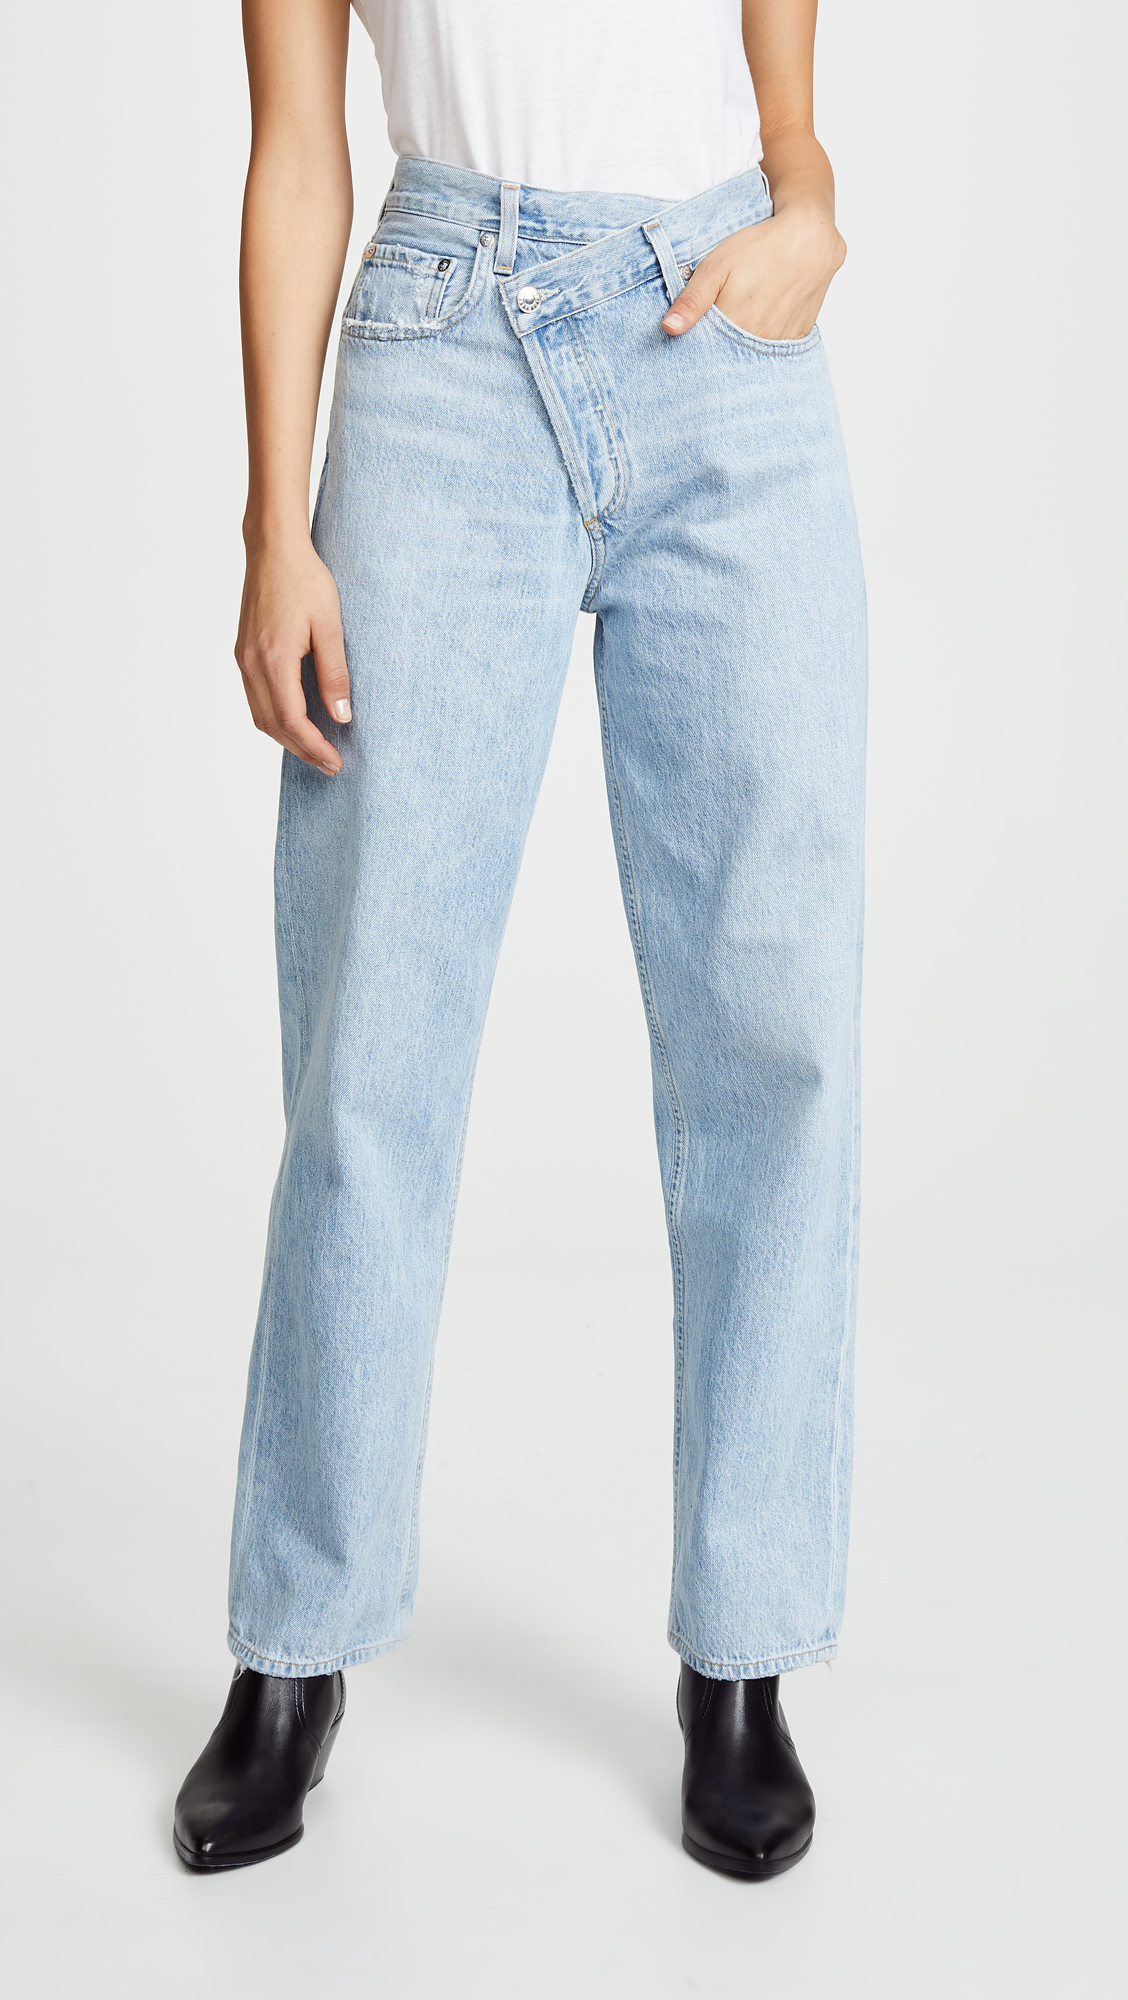 criss cross, crossover jeans, wrap jeans, boyfriend jeans, slouchy, a gold e